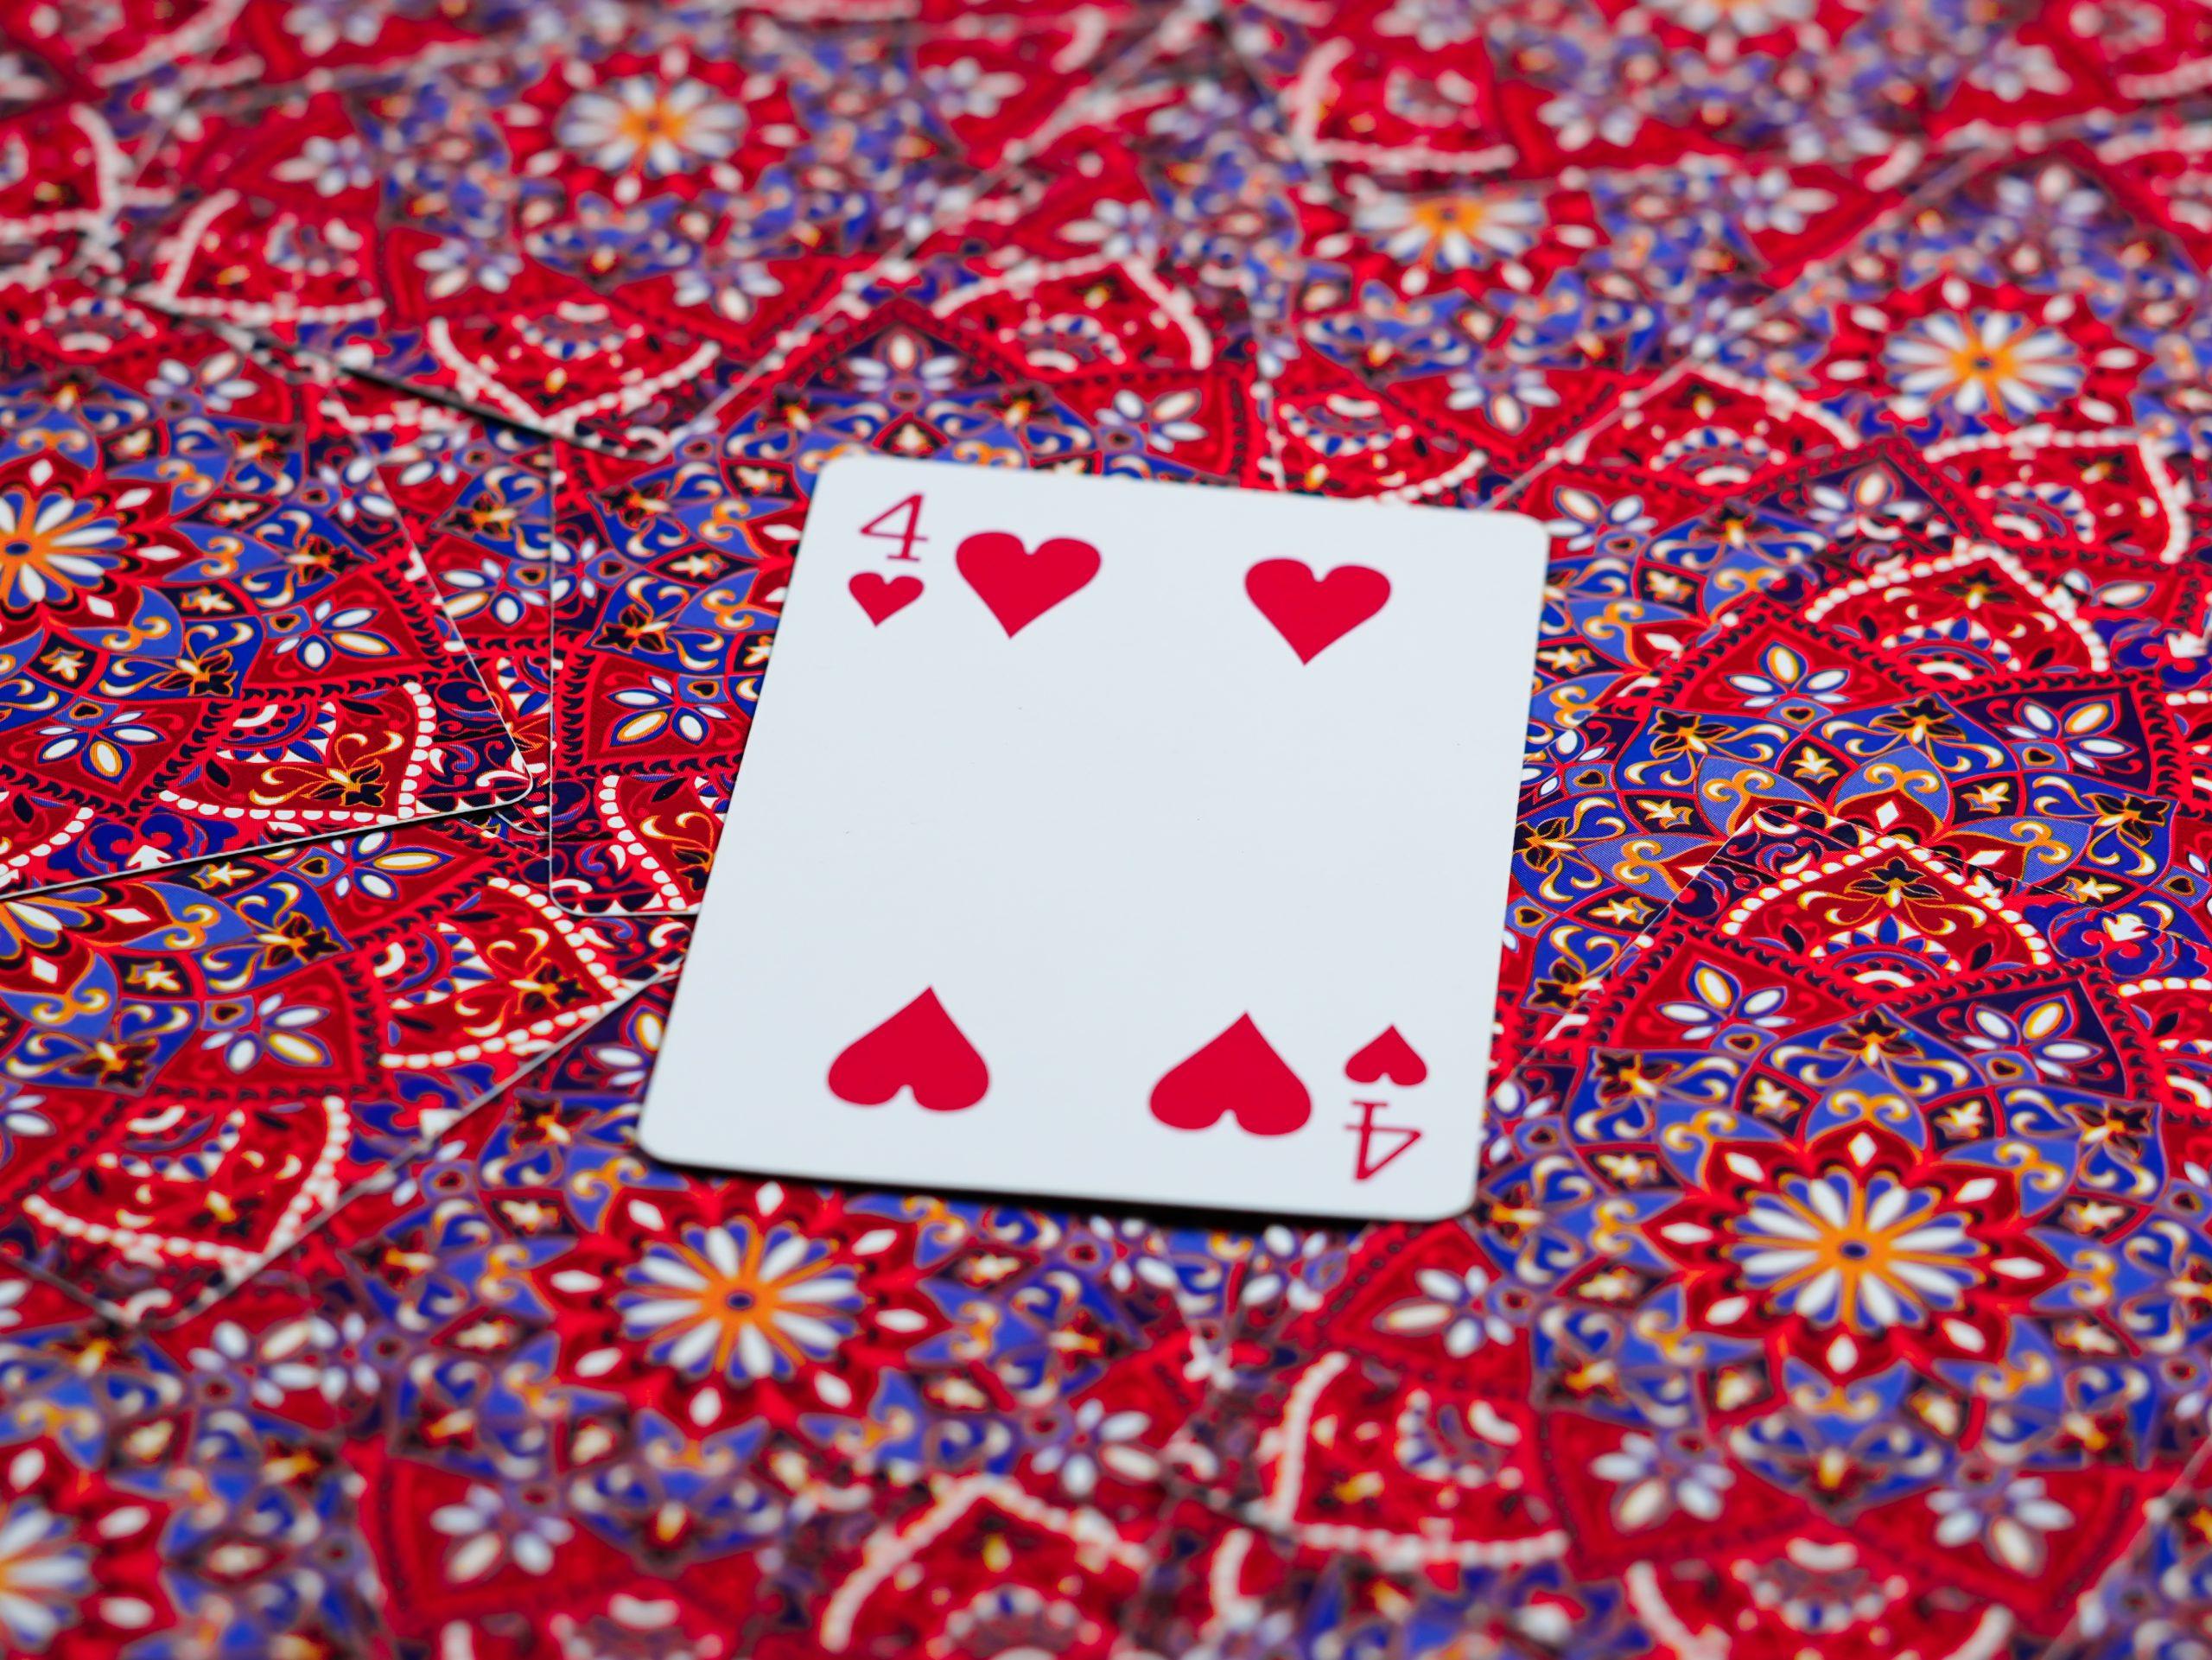 Four of Heart Card on Focus